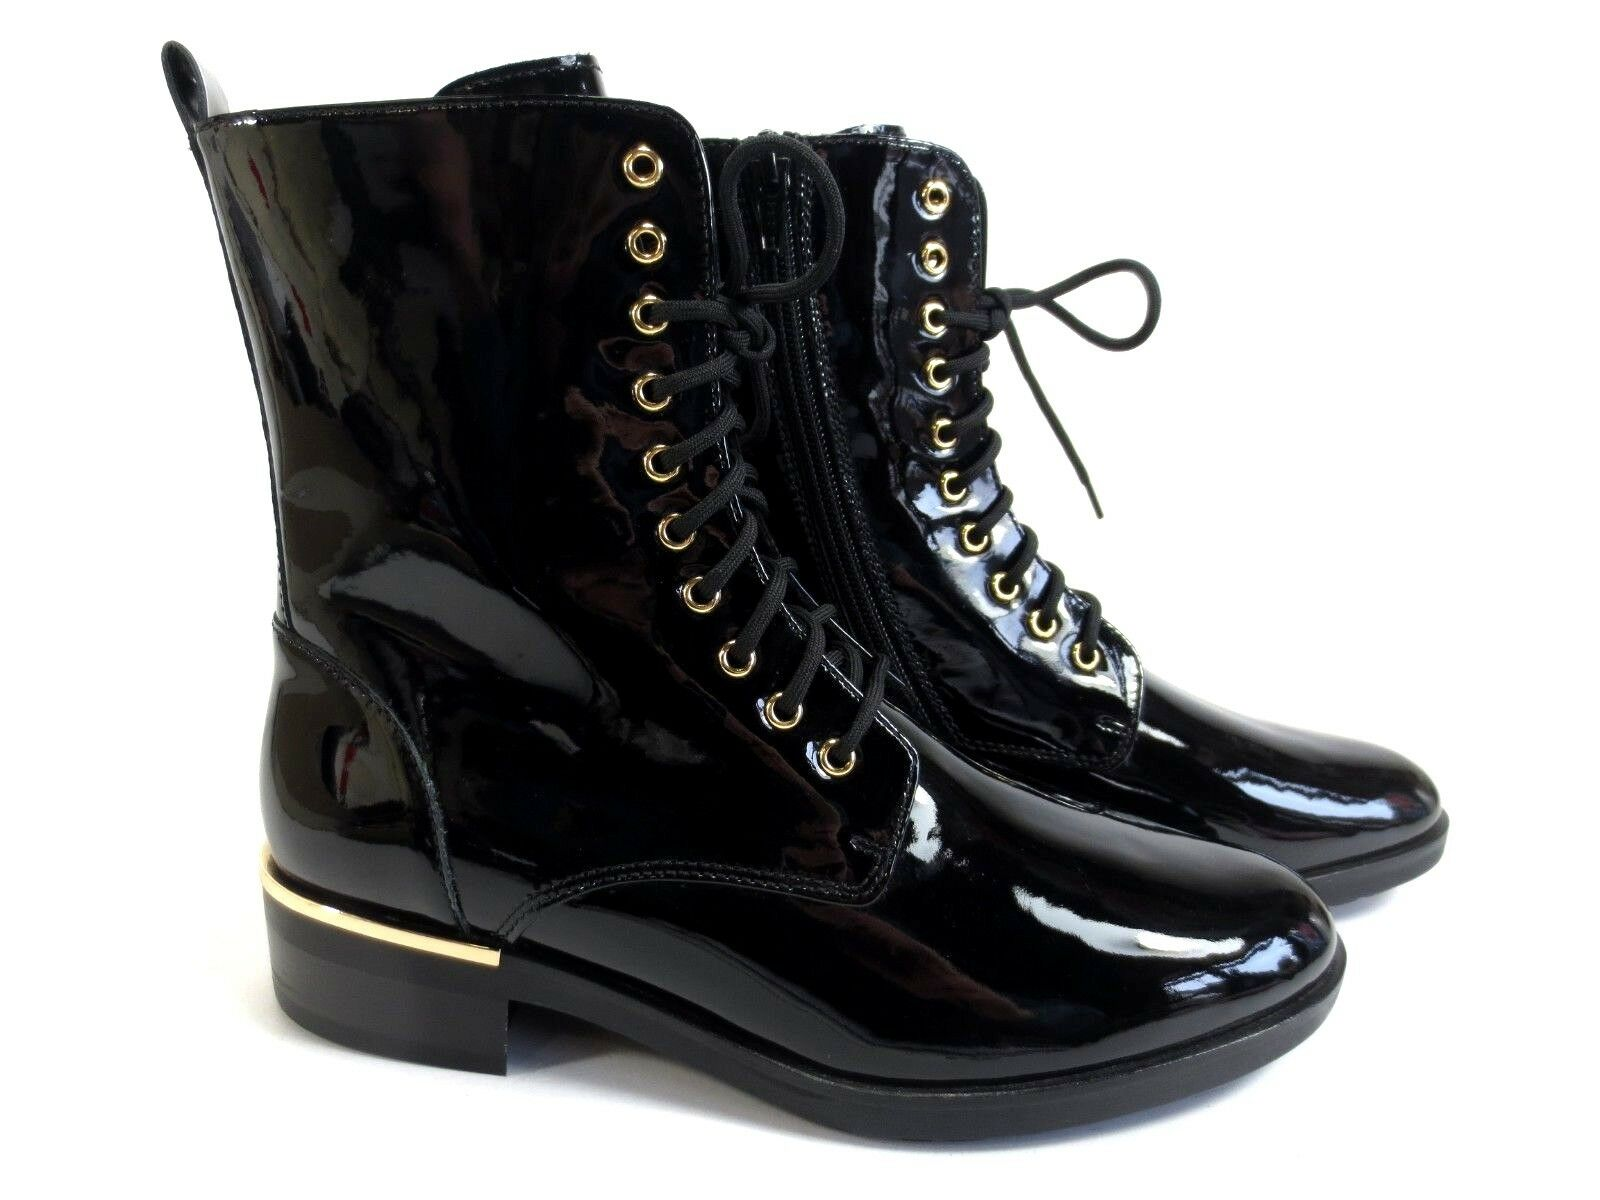 Högl bottes bottines Cuir verni Chaussures Chaussures Chaussures Noir Or Neuf 179,90 b866ce